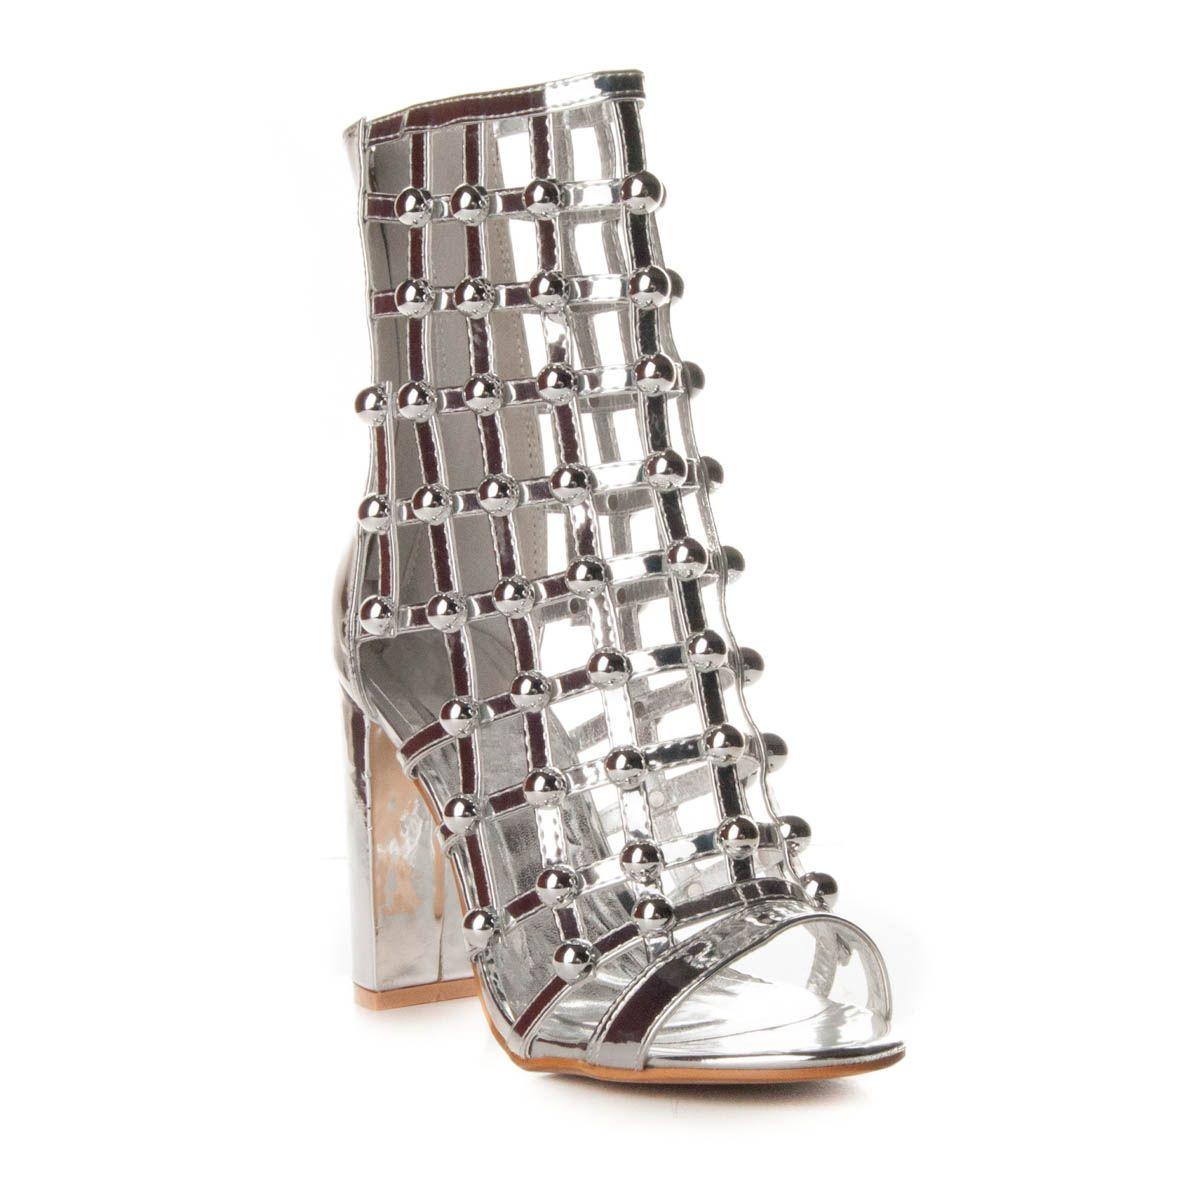 Montevita Block Heel Sandal in Silver